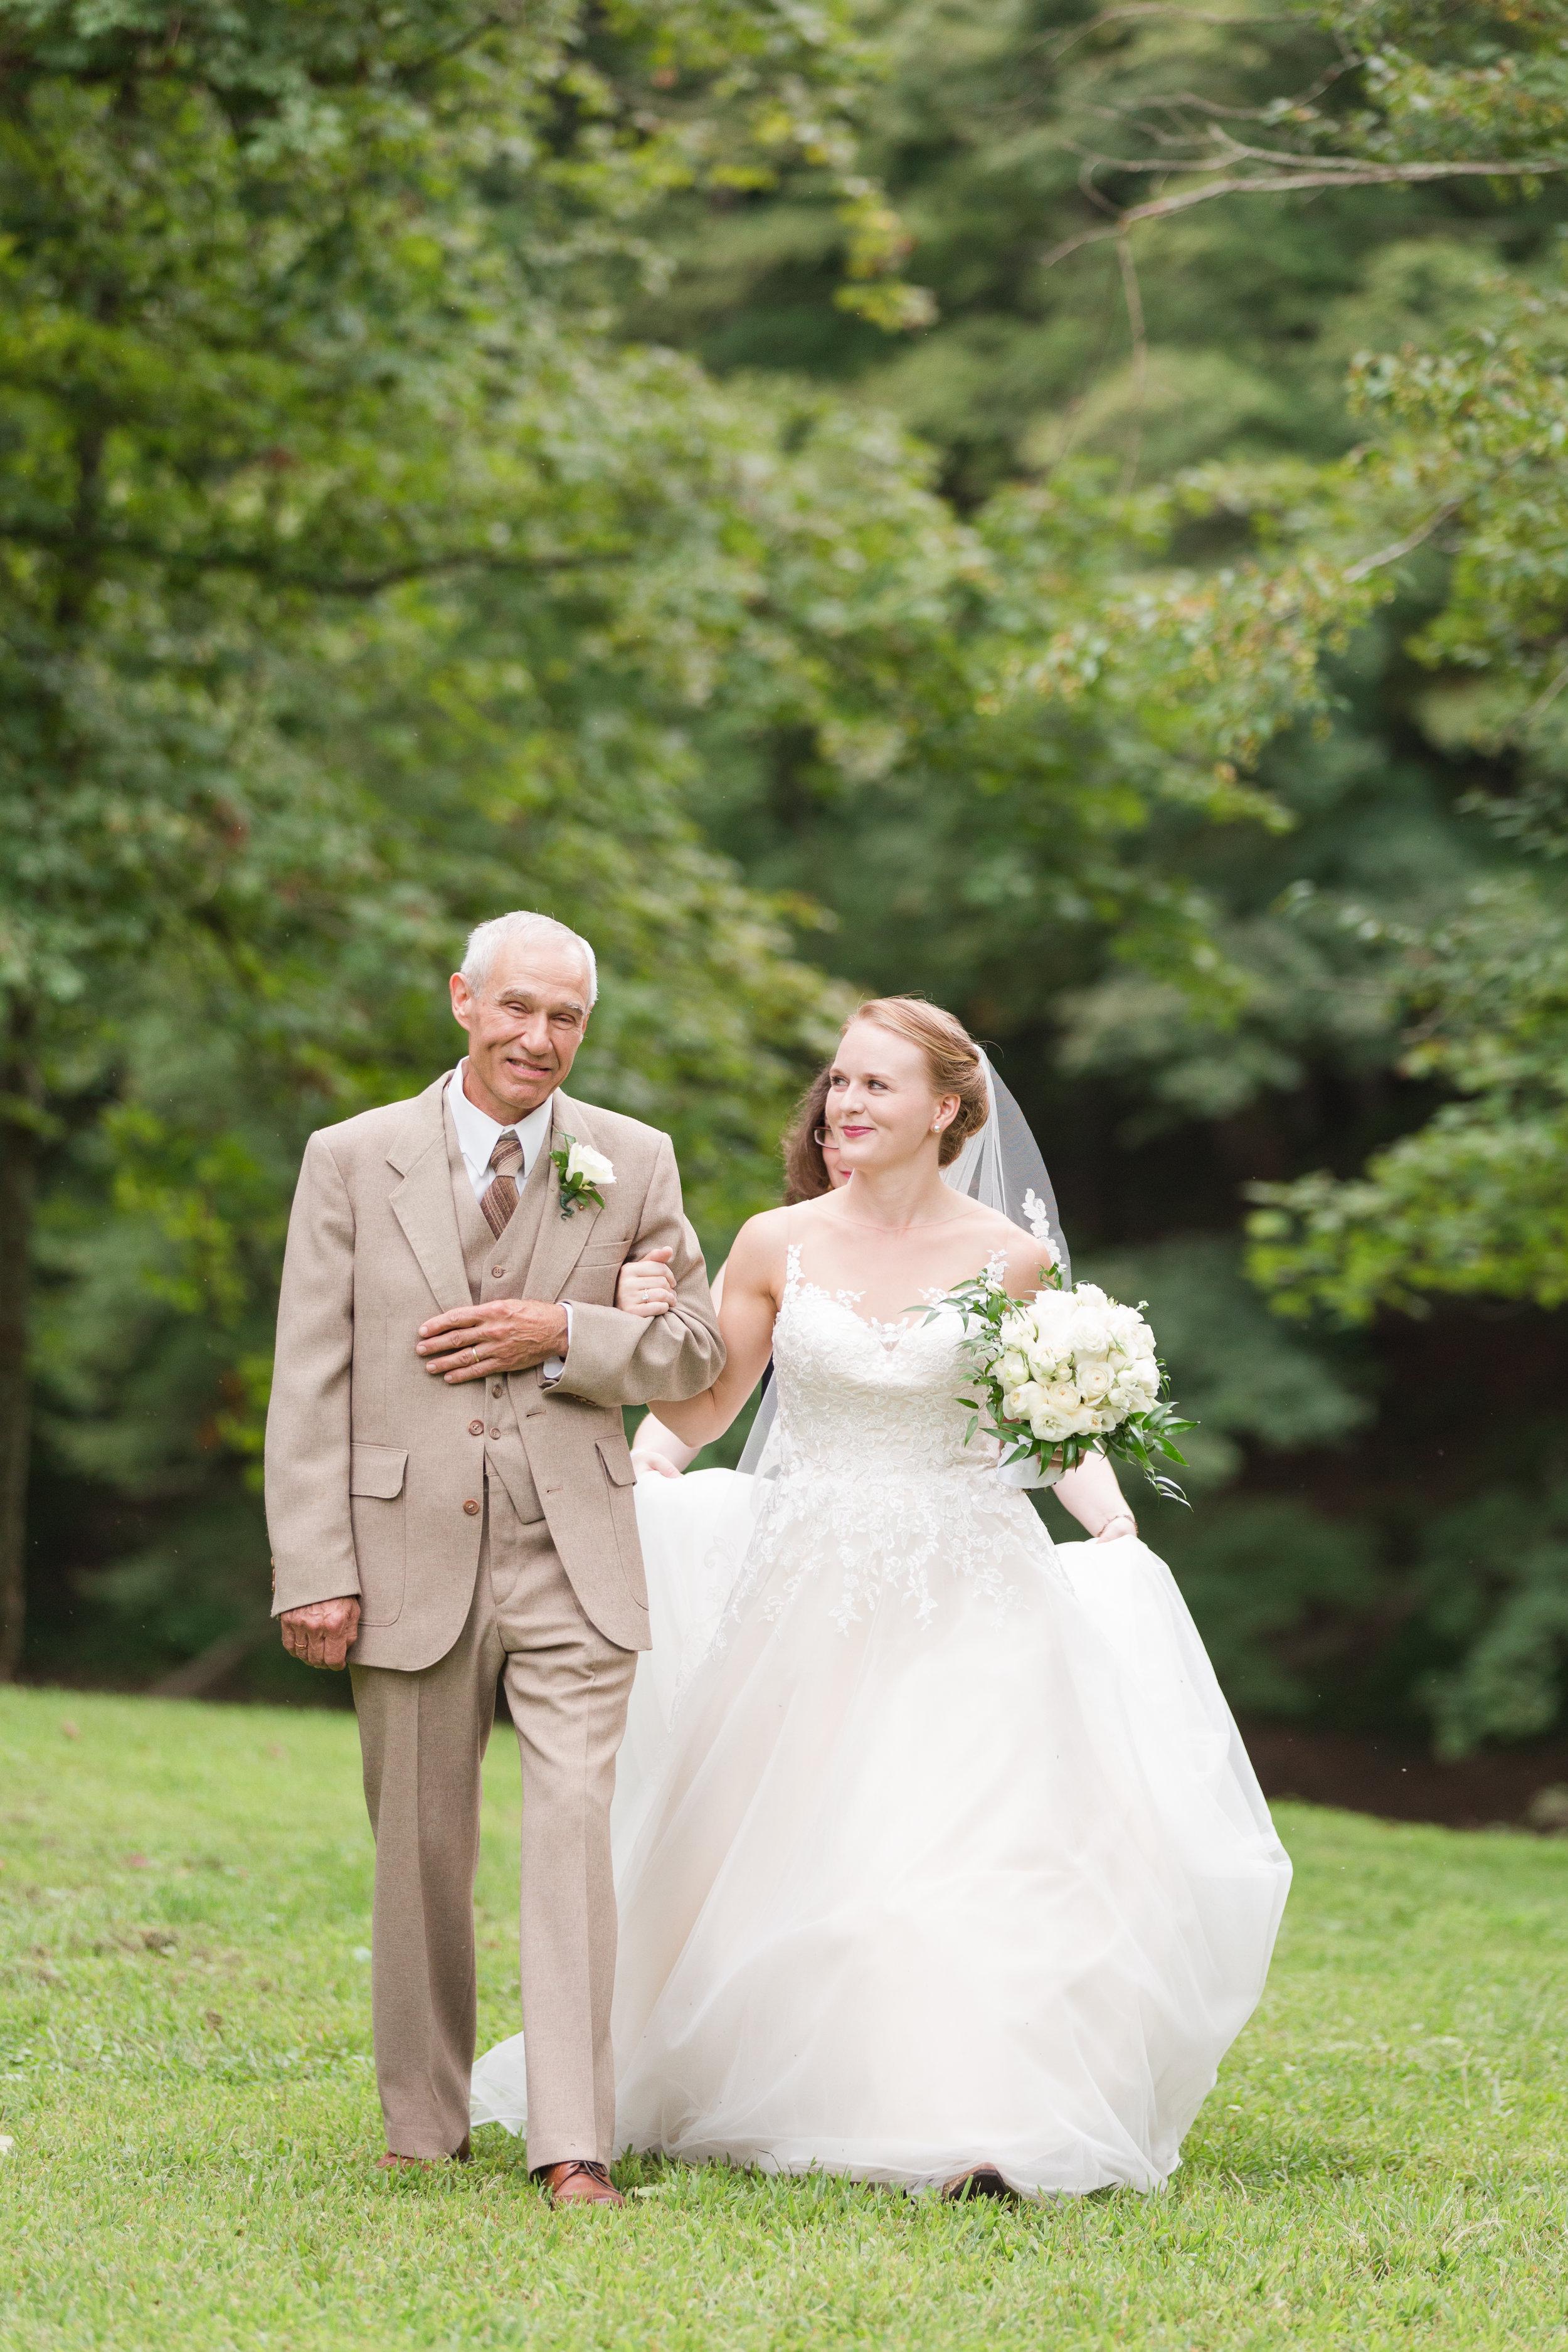 Garton-Demarco Wedding-Ceremony -18.jpg